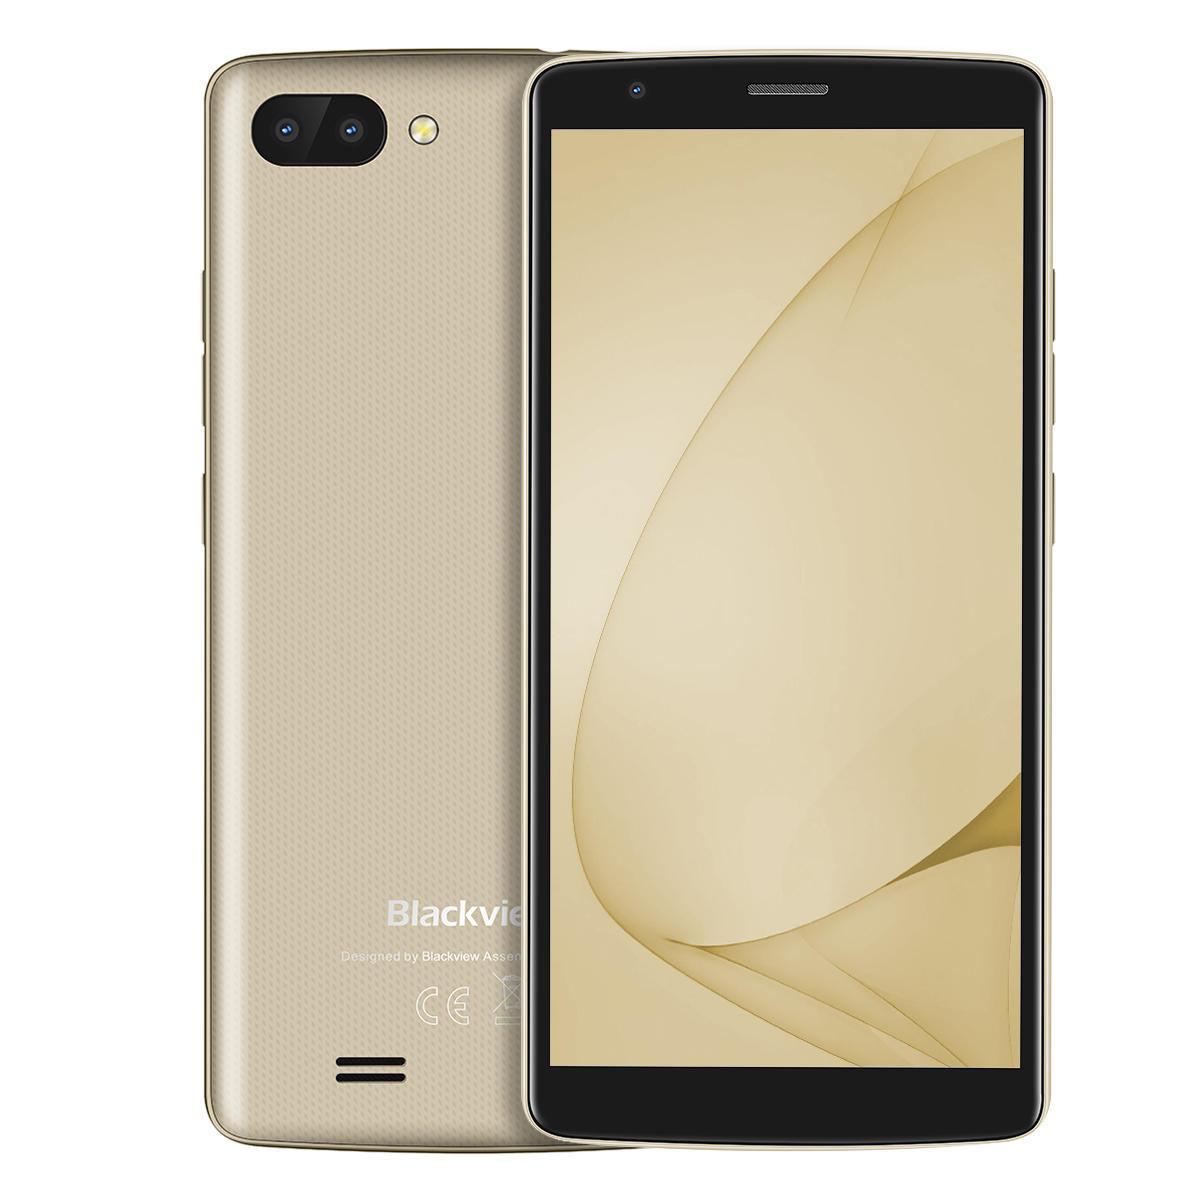 banggood Blackview A20 3G MTK6580 1.3GHz 4コア GOLD(ゴールド)